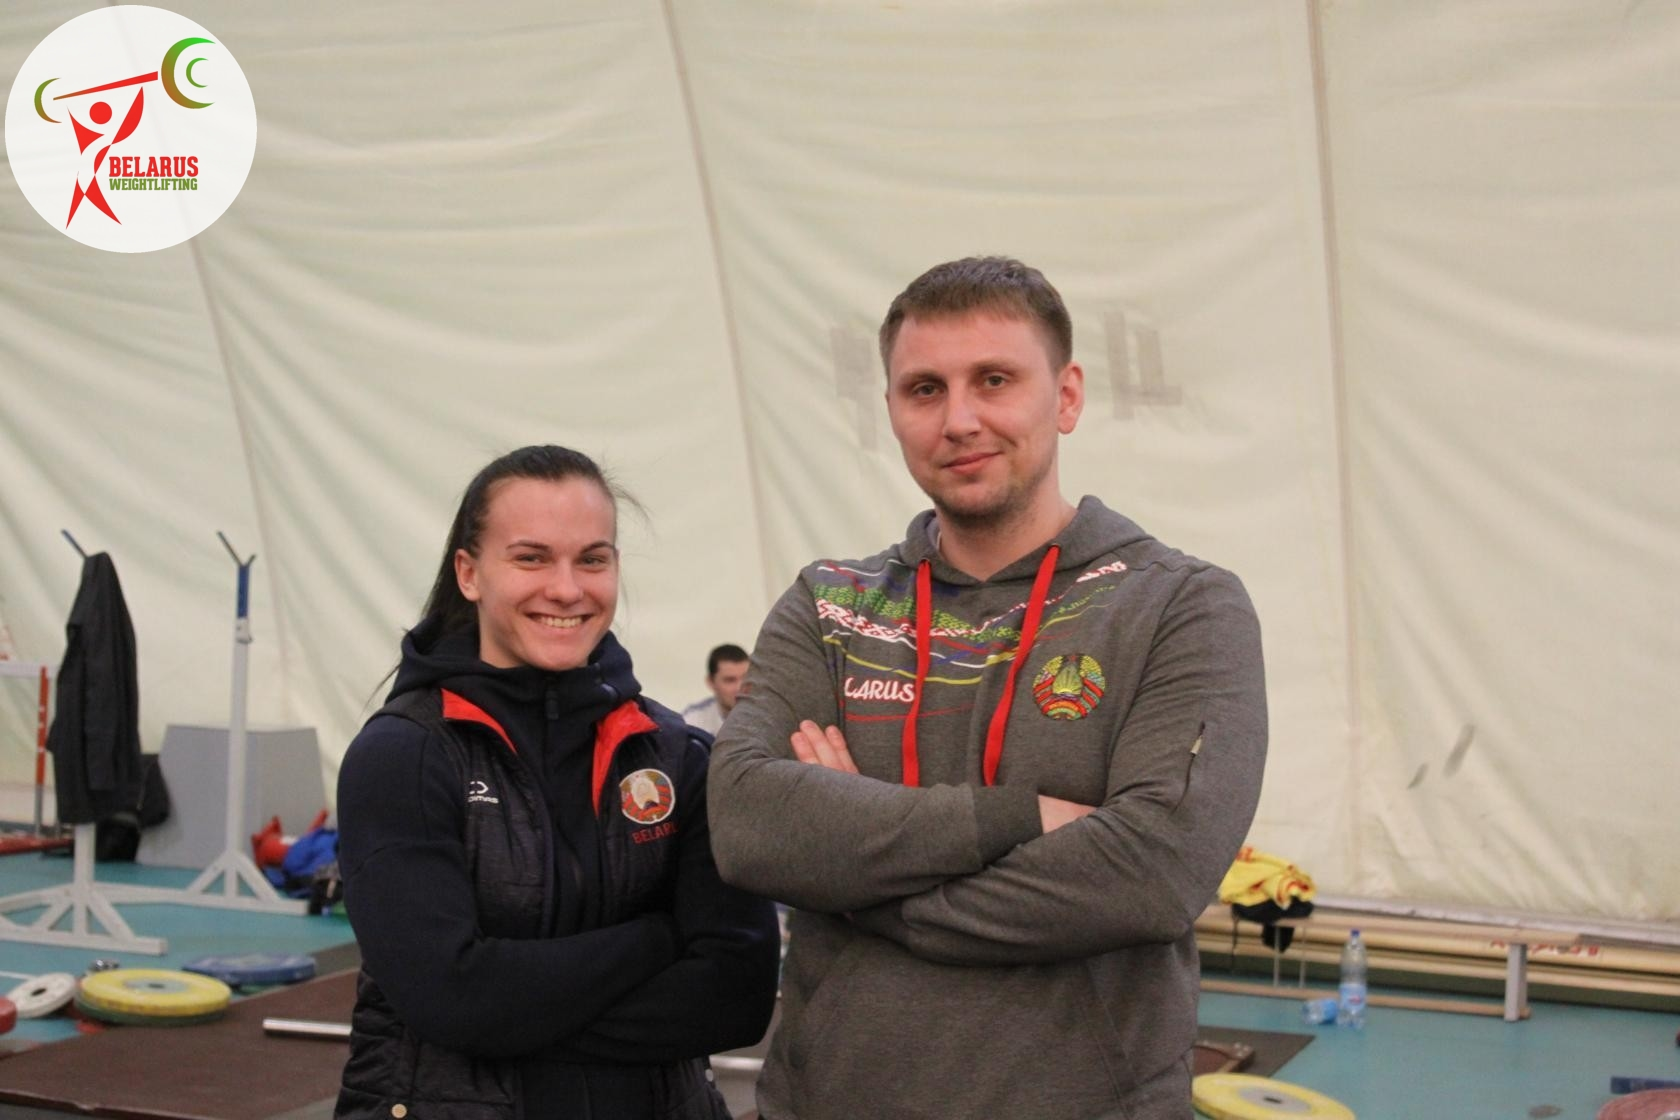 Daria Naumova, and Valeriy Sizenok